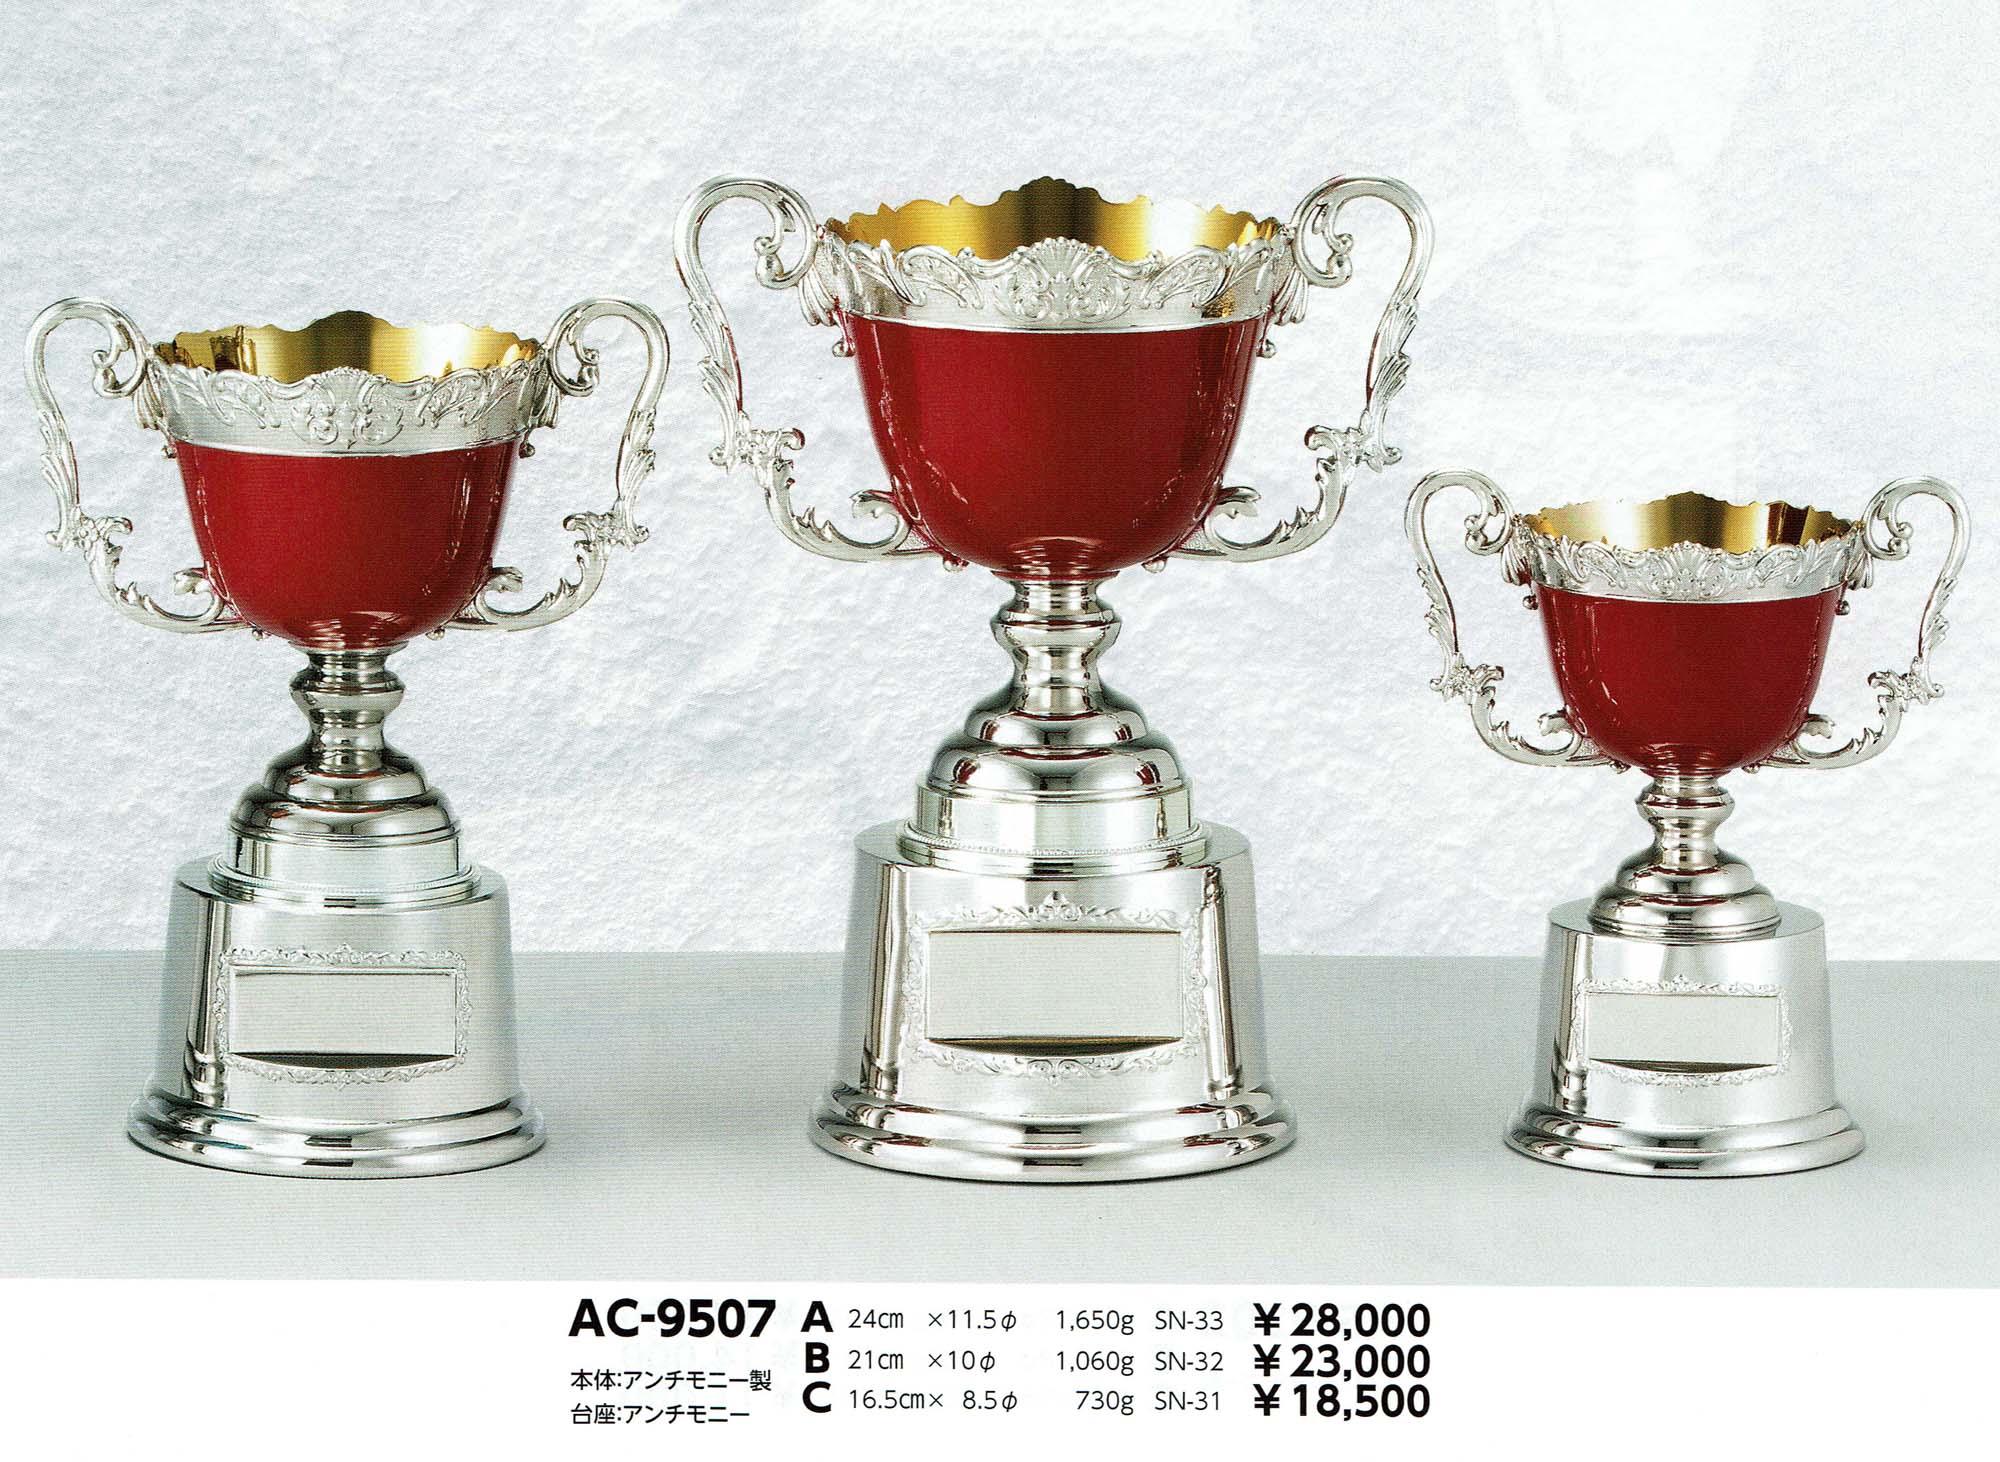 AC9507